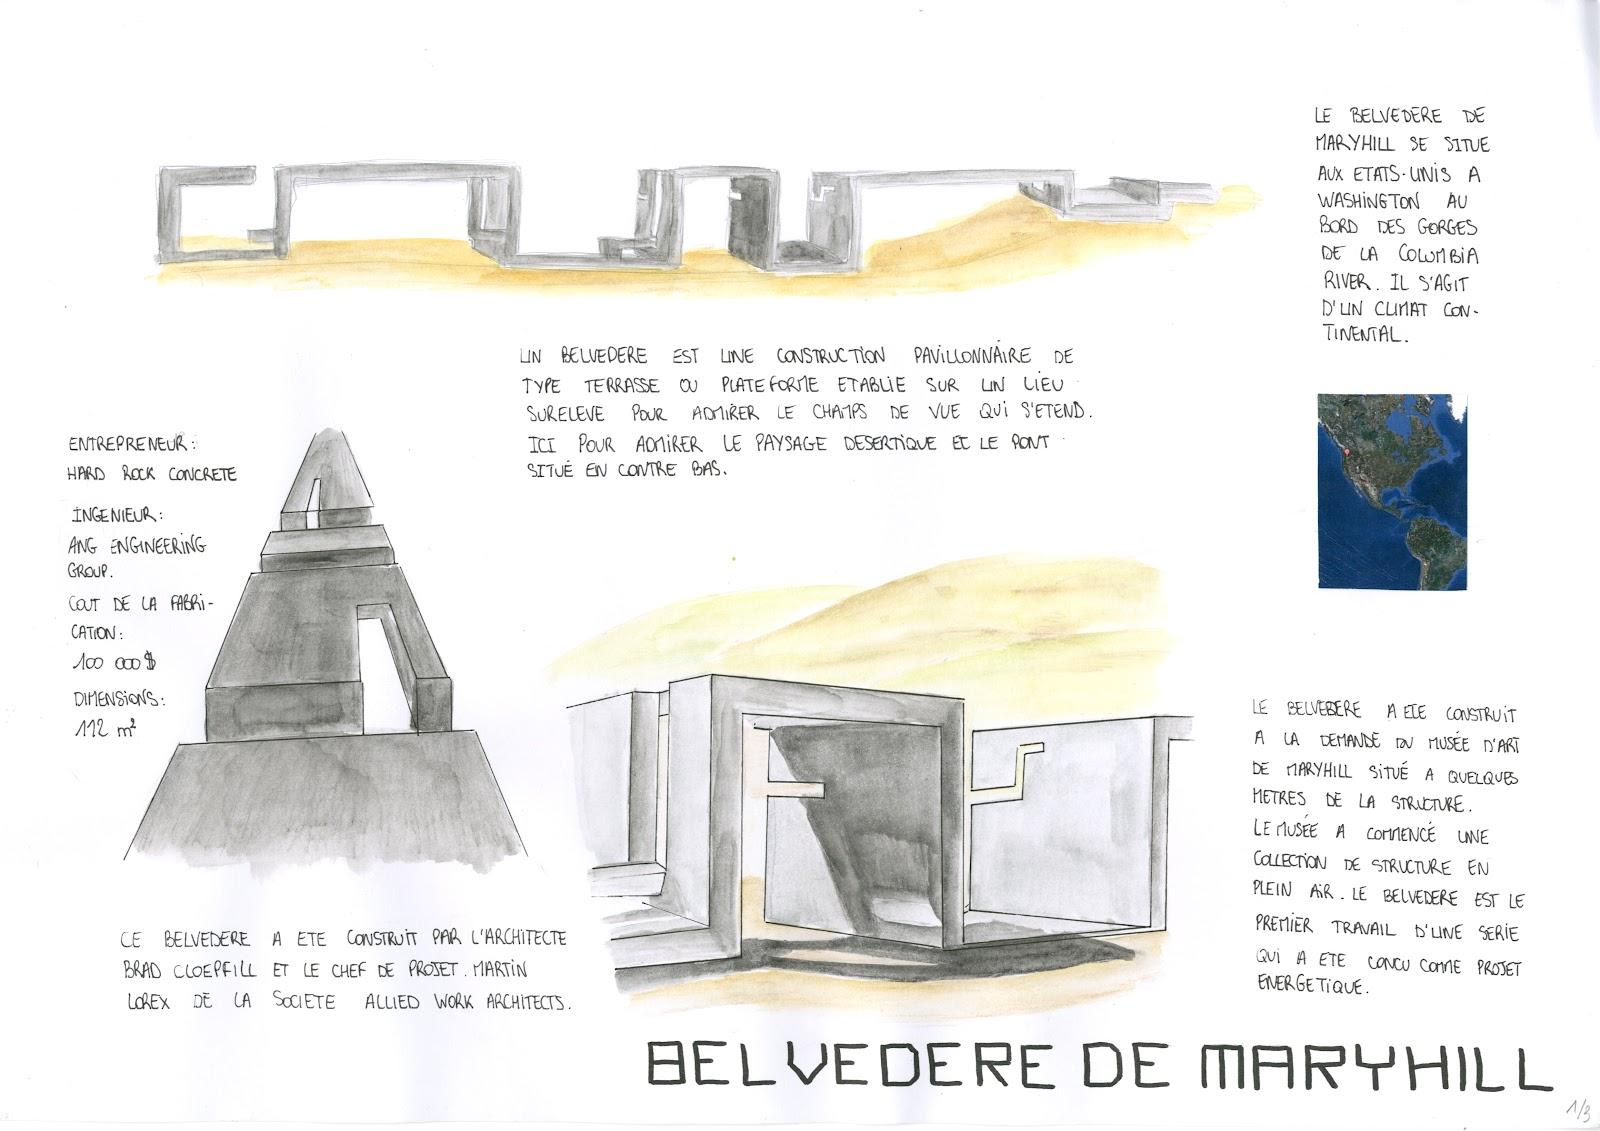 etude de cas micro architecture pr sentation de travaux. Black Bedroom Furniture Sets. Home Design Ideas